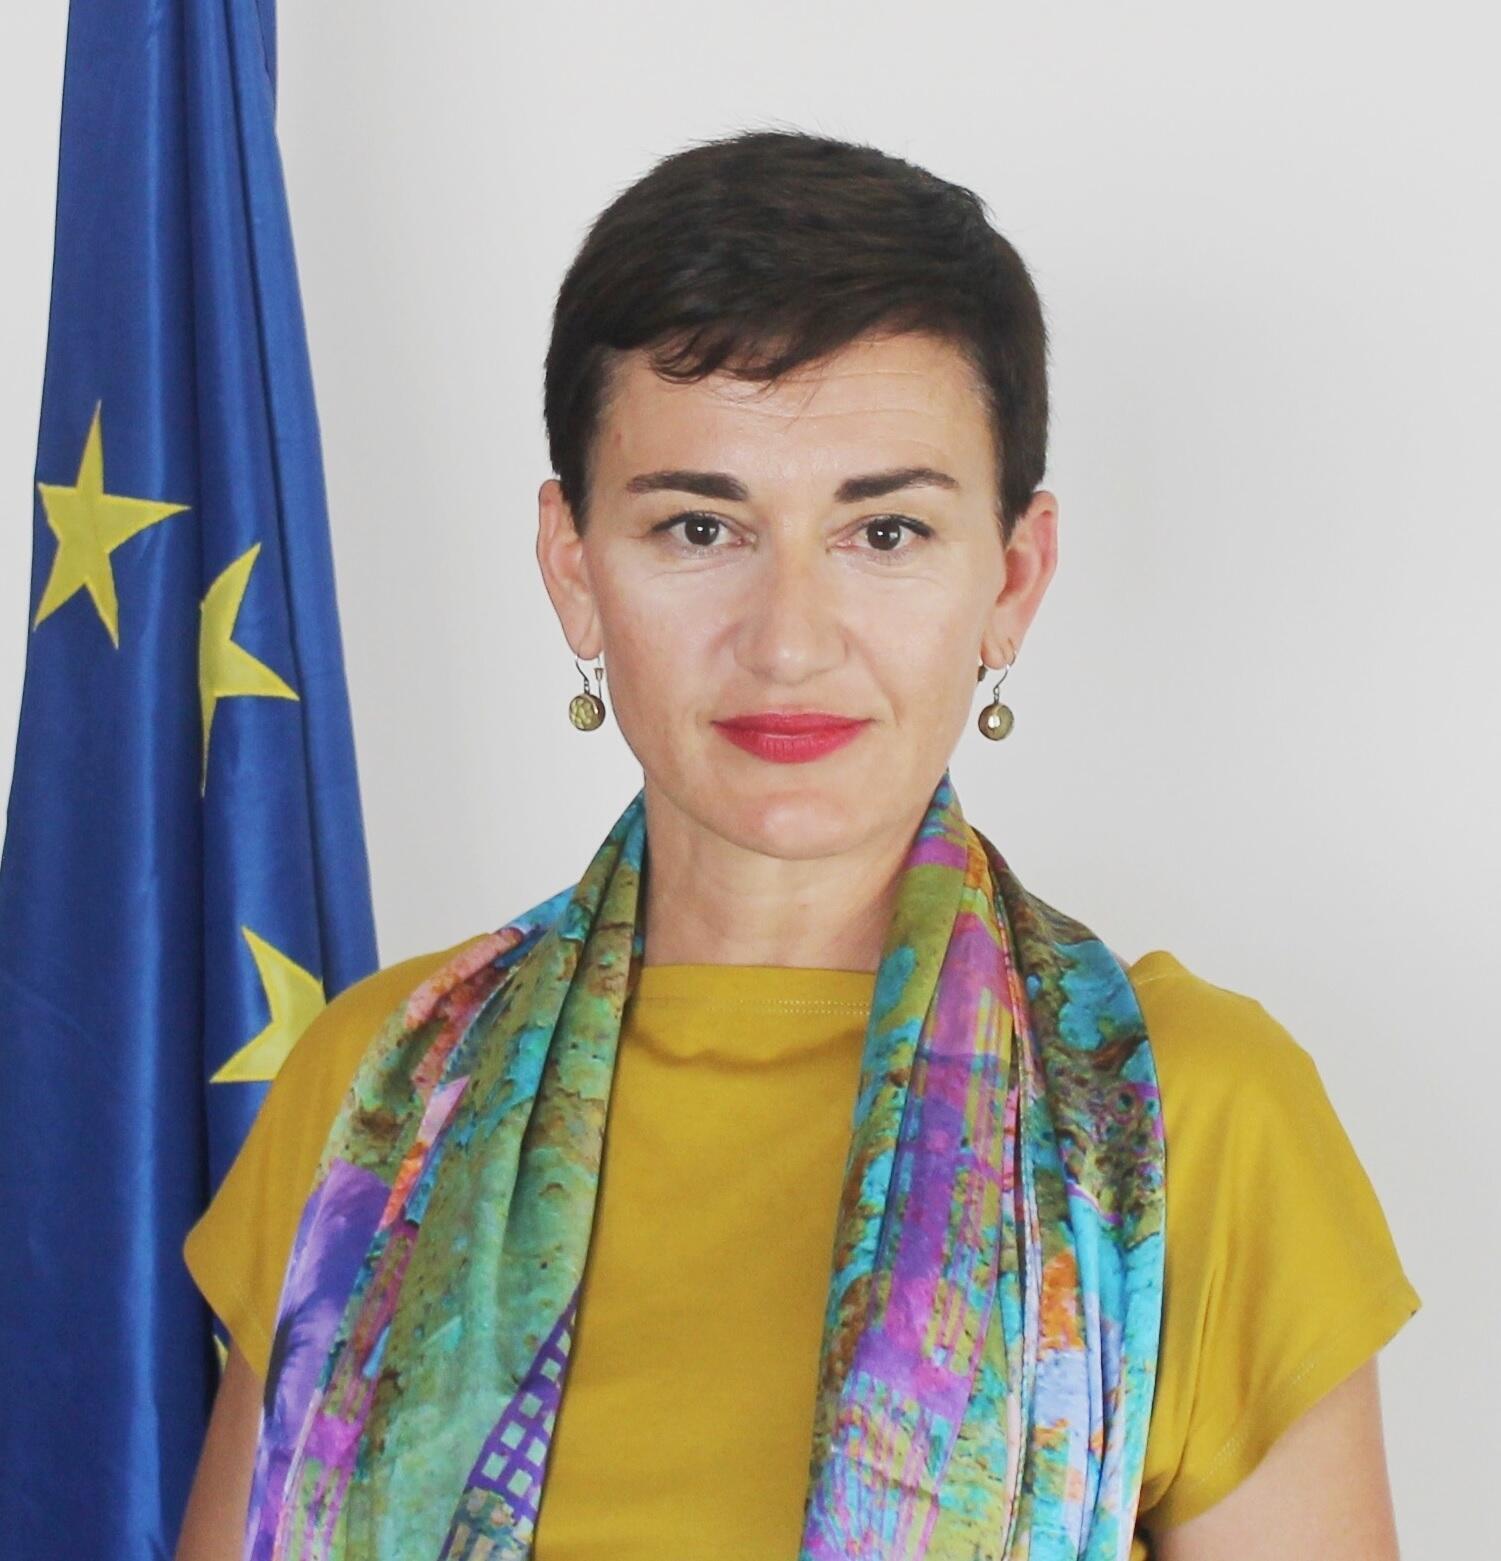 Irène Mingasson, ambassadrice de l'Union européenne au Sénégal.